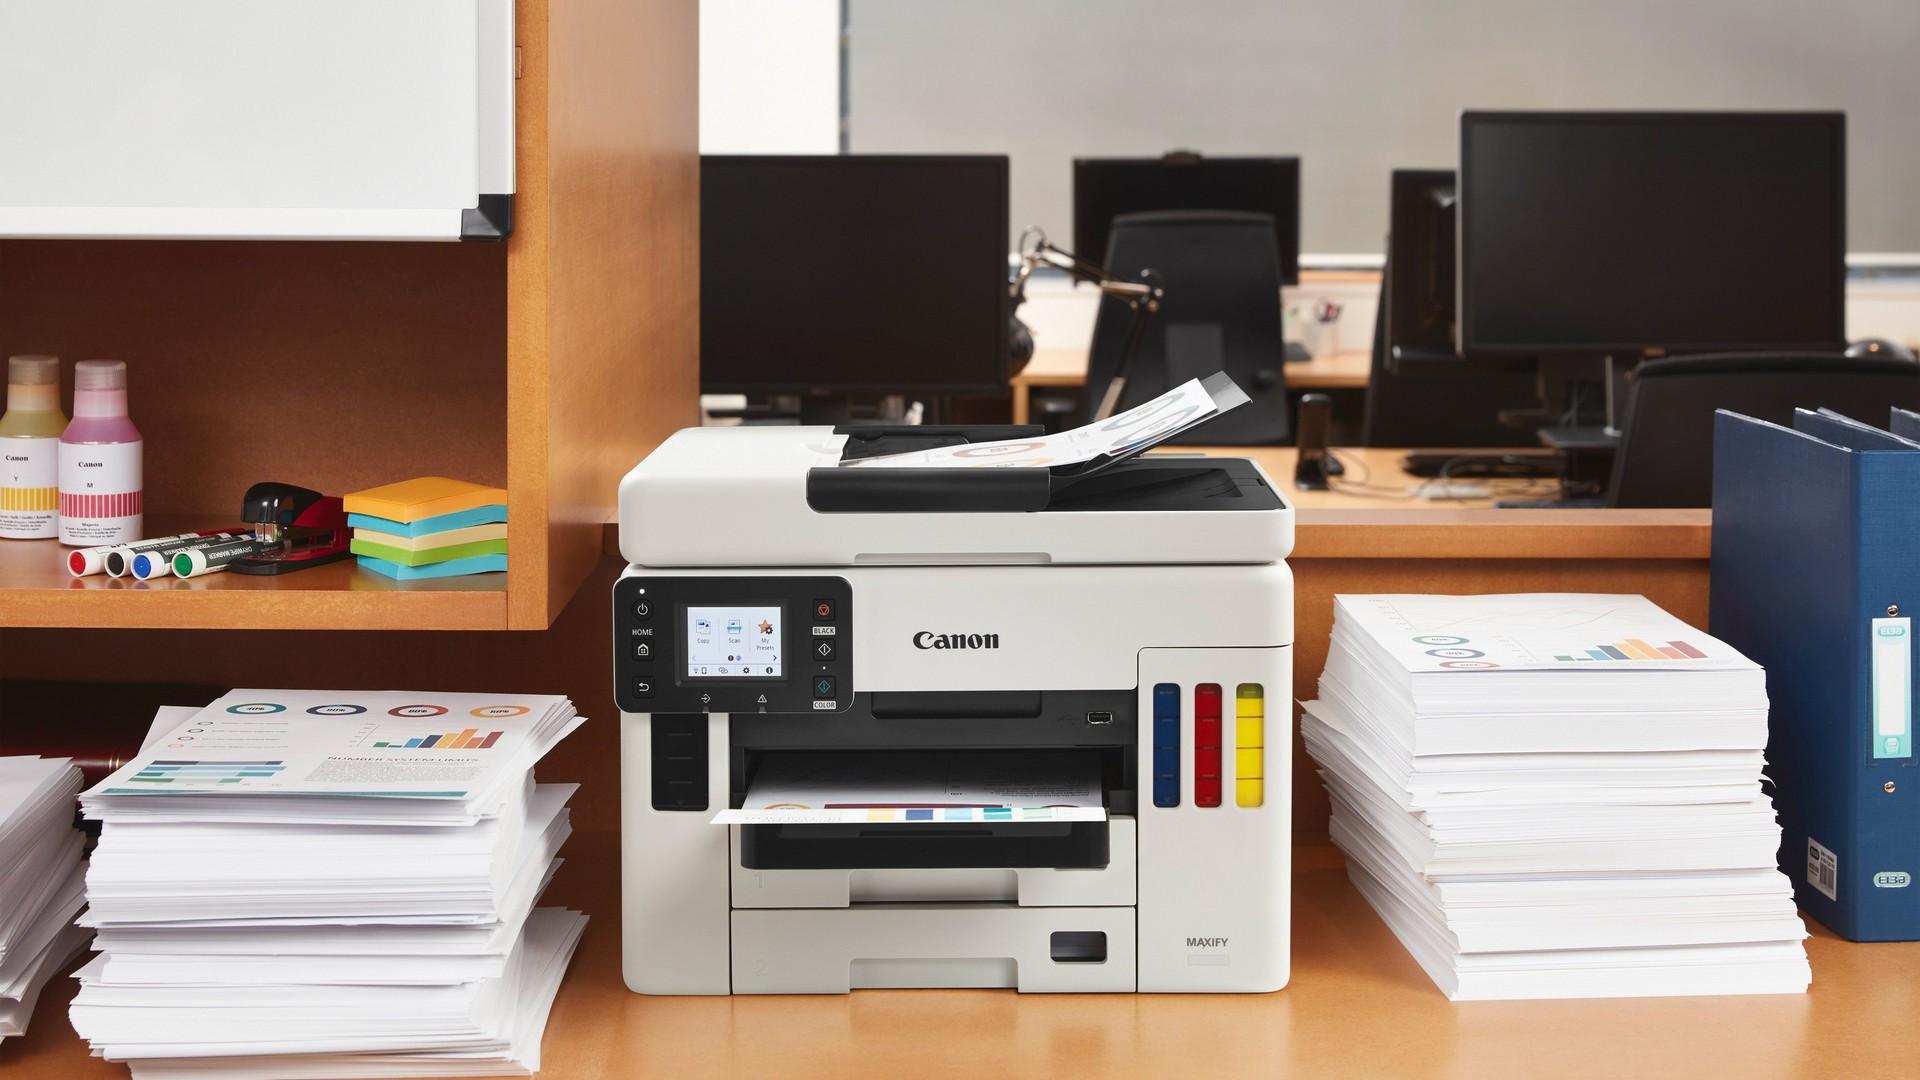 Imprimare cu costuri reduse cu MAXIFY GX6050 şi MAXIFY GX7050